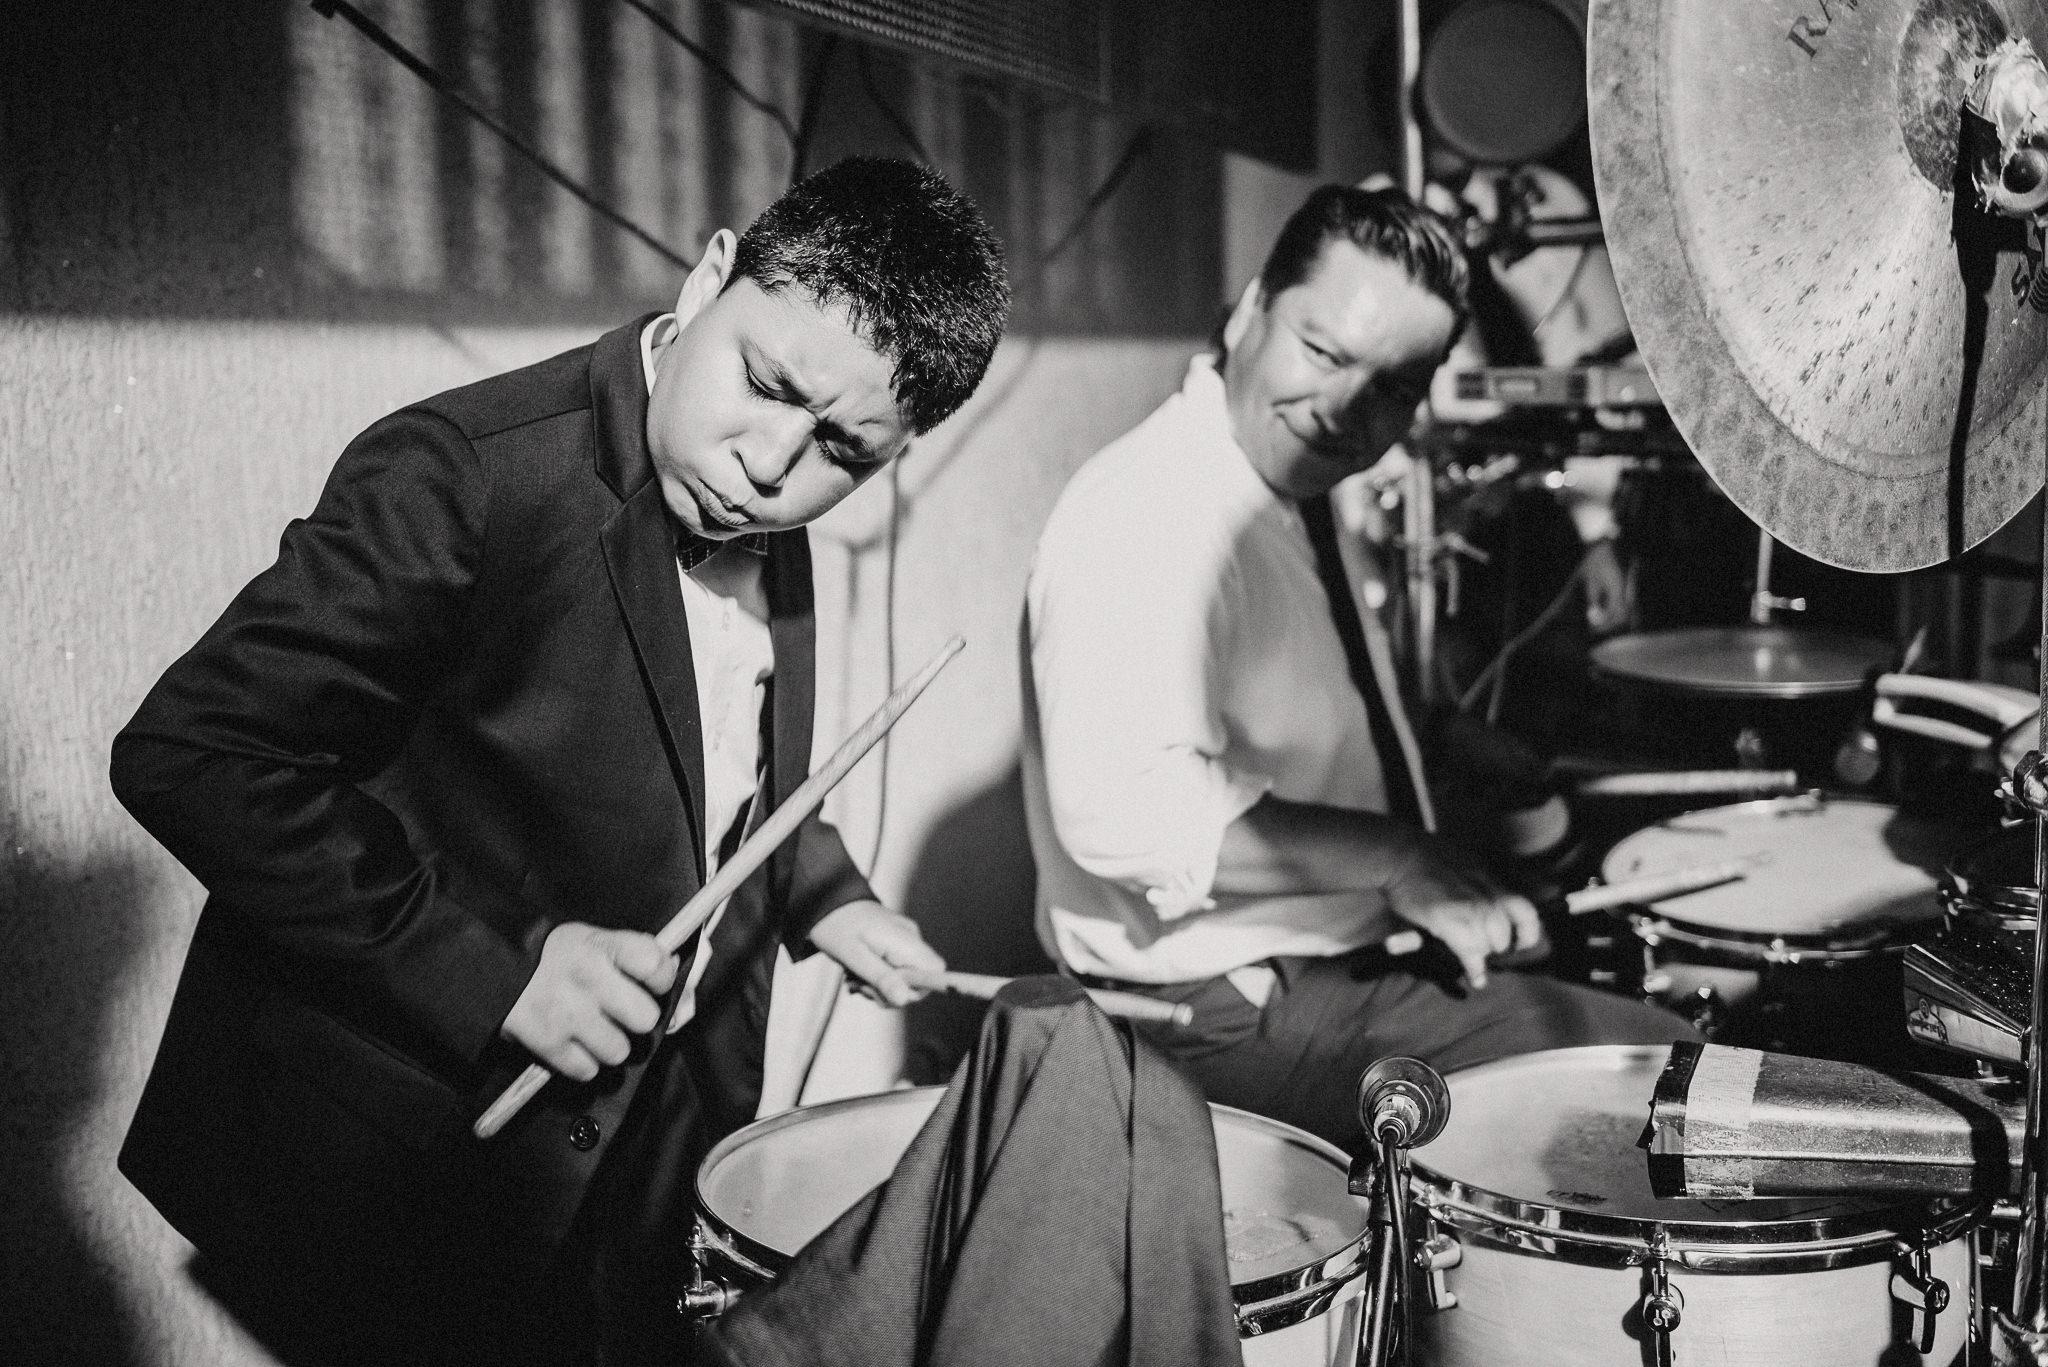 Wedding-Boda-Tulancingo-Hidalgo-Salon-Essenzia-Luis-Houdin-85-film